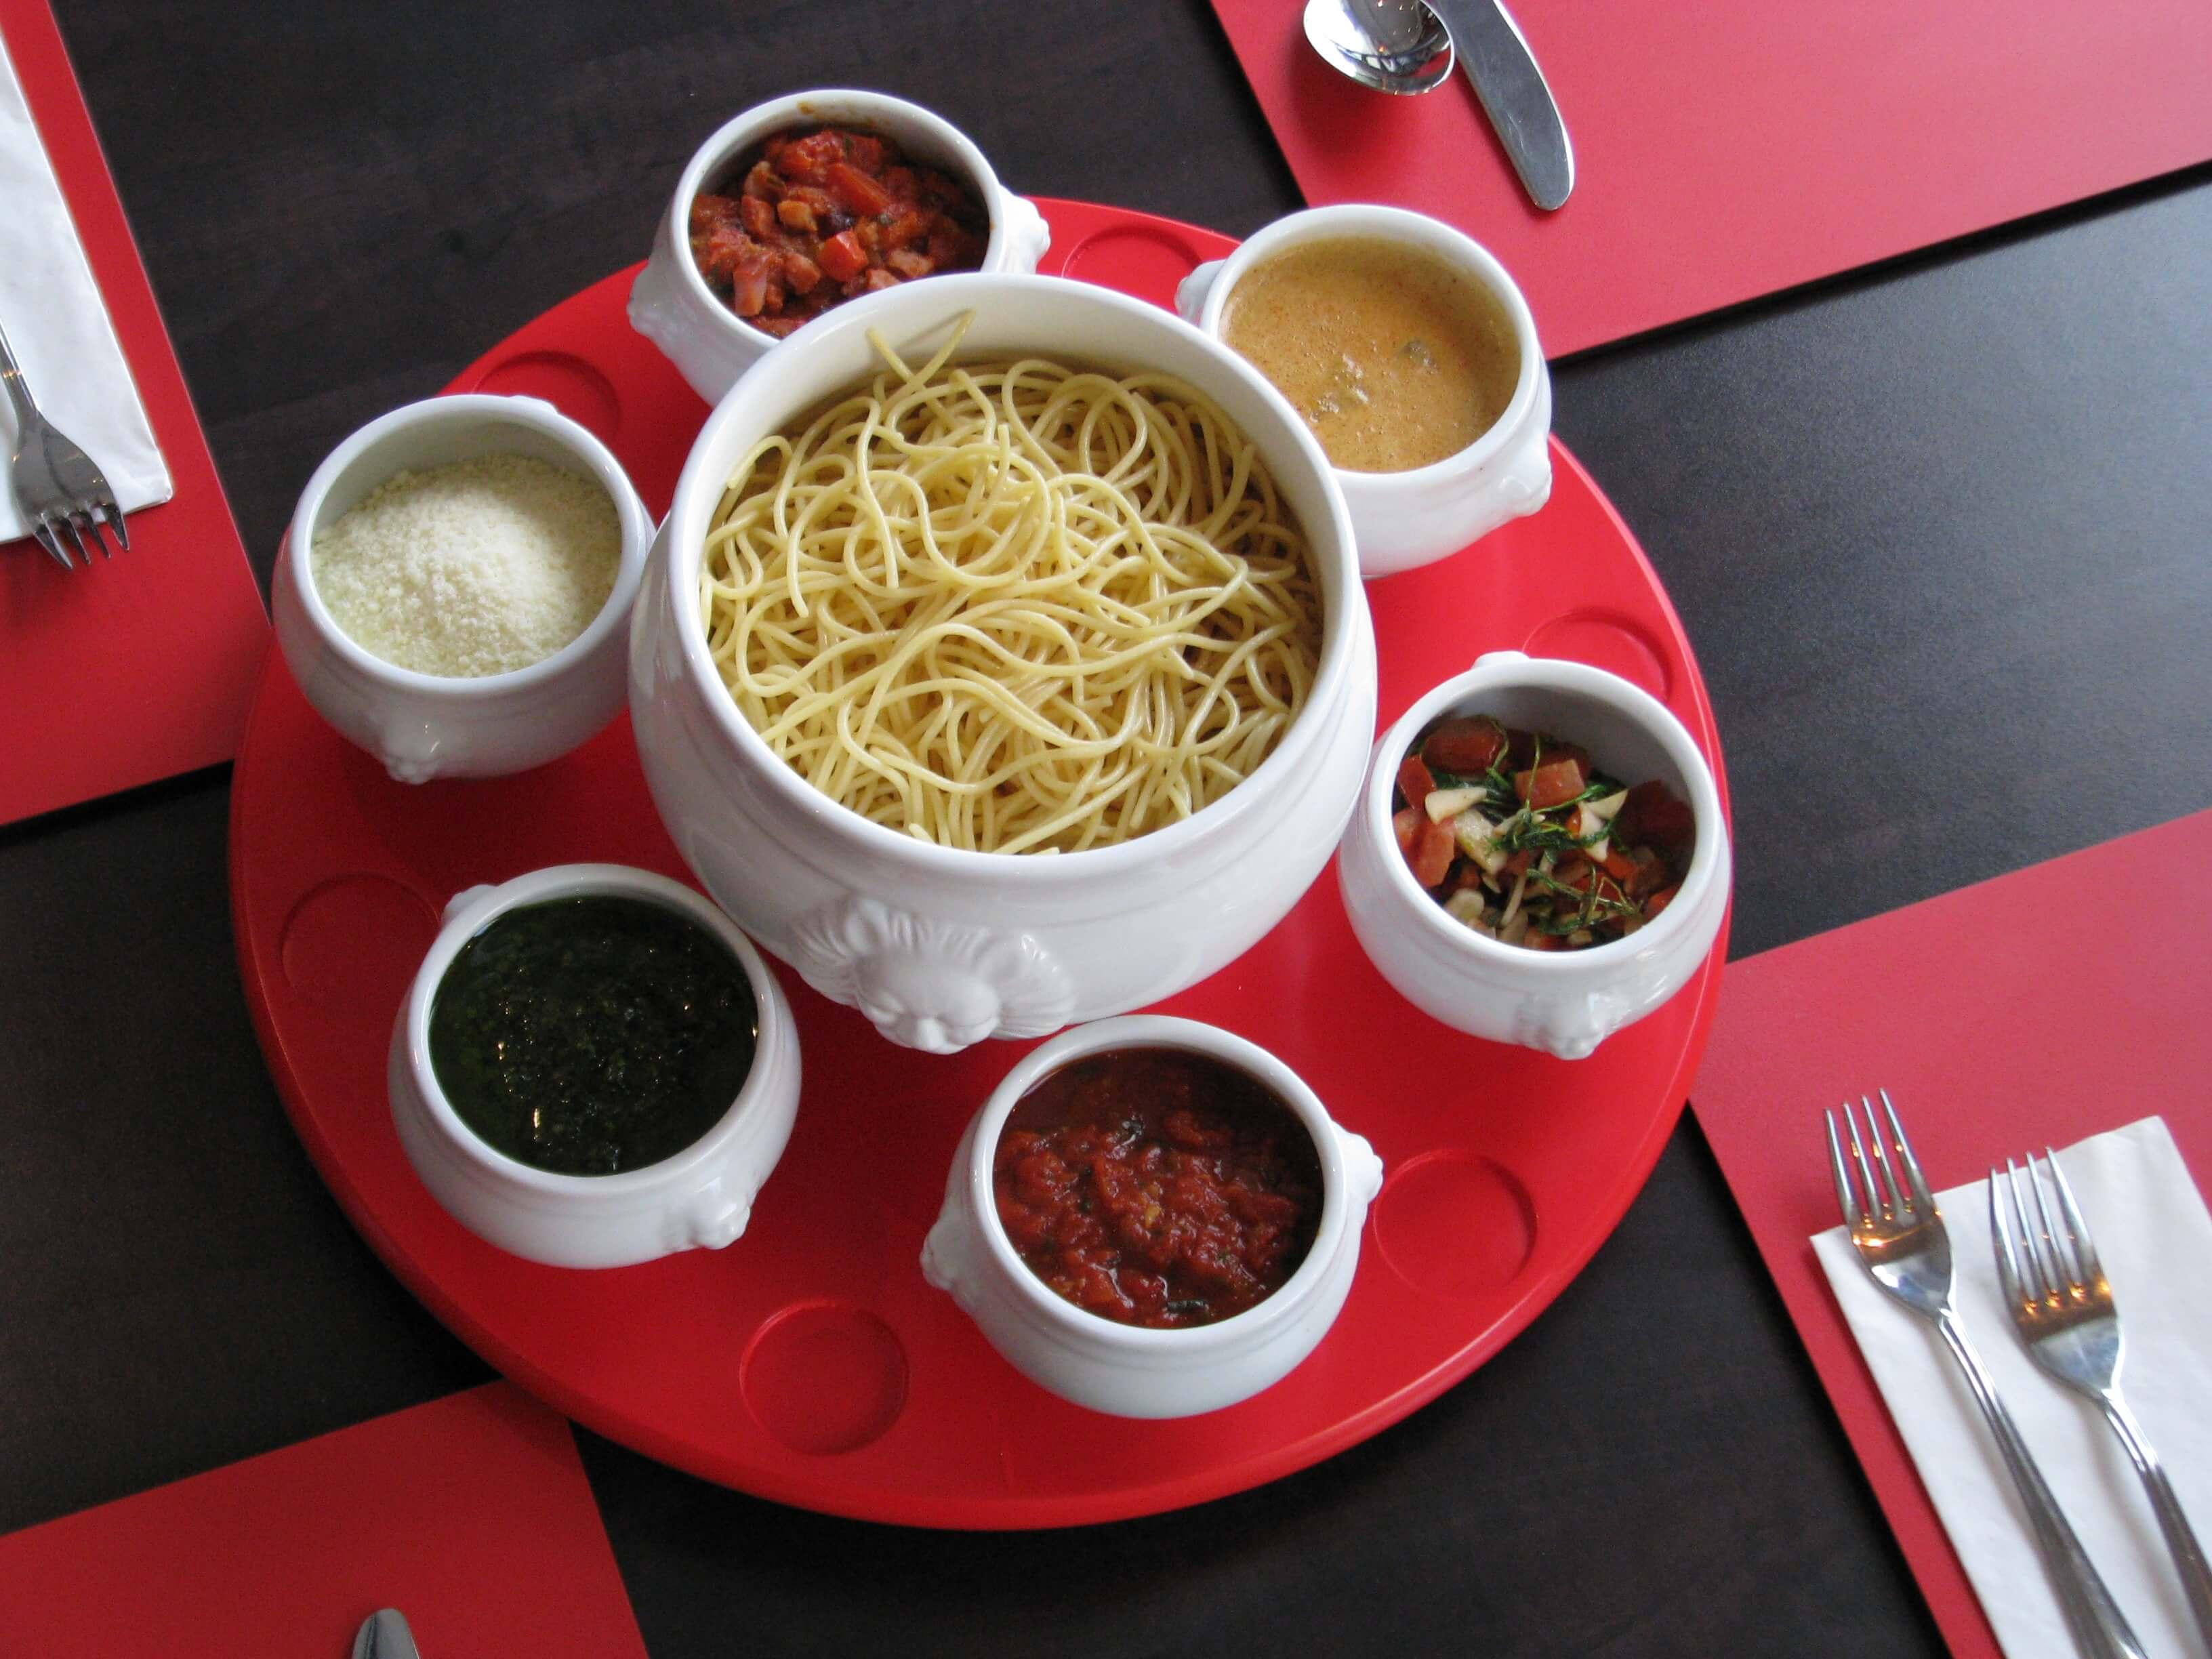 restaurant-krone-spaghetti-karrussell.JPG